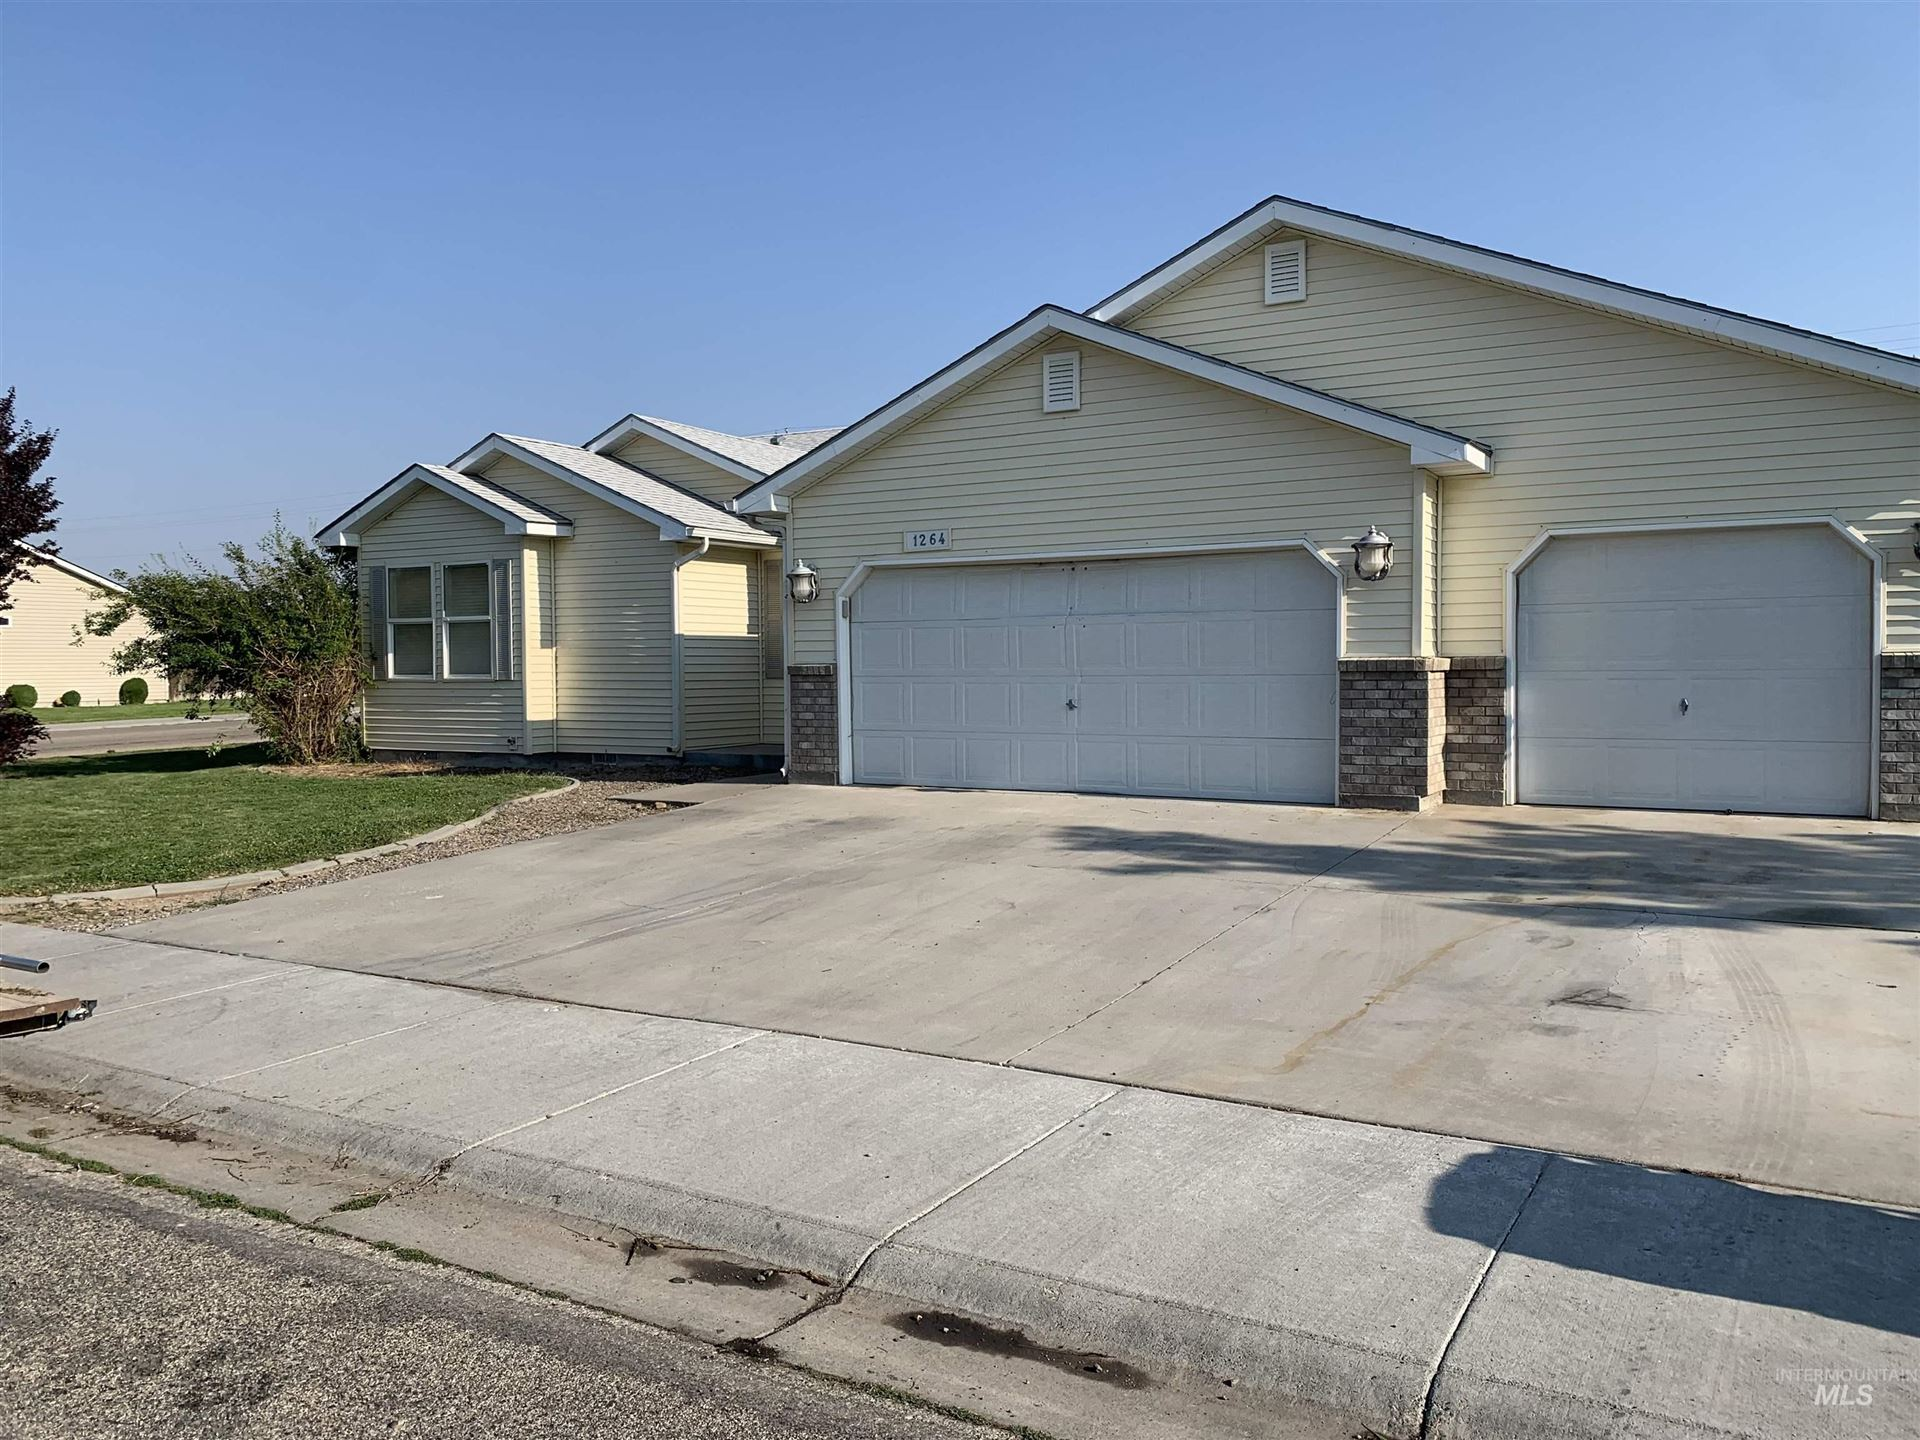 1264 NW Mandarin, Mountain Home, ID 83647 - MLS#: 98814369